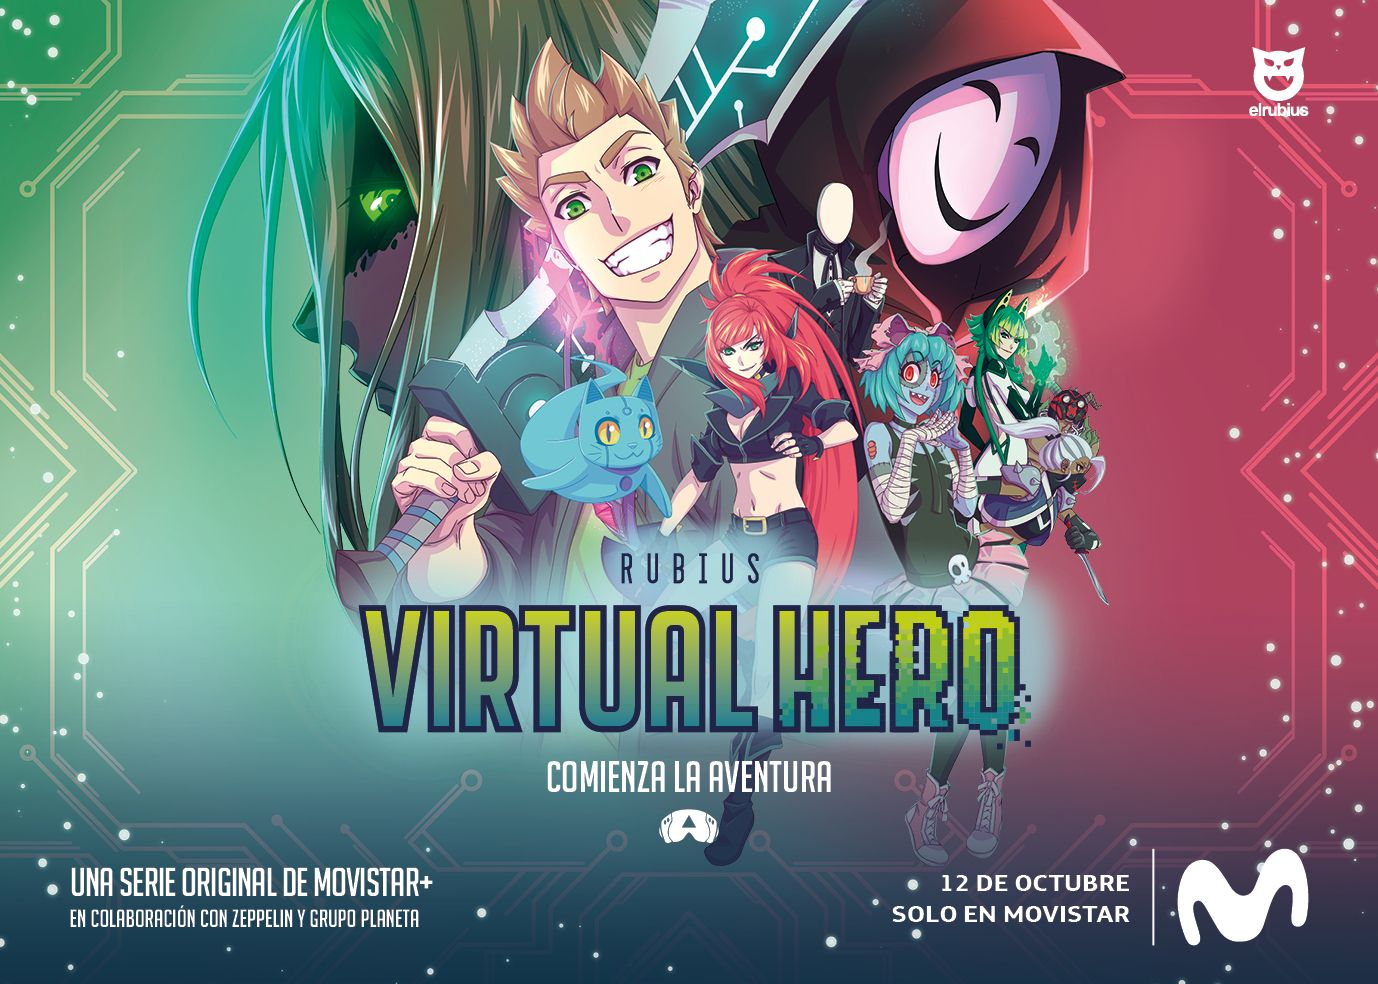 Virtual dating game anime fighting